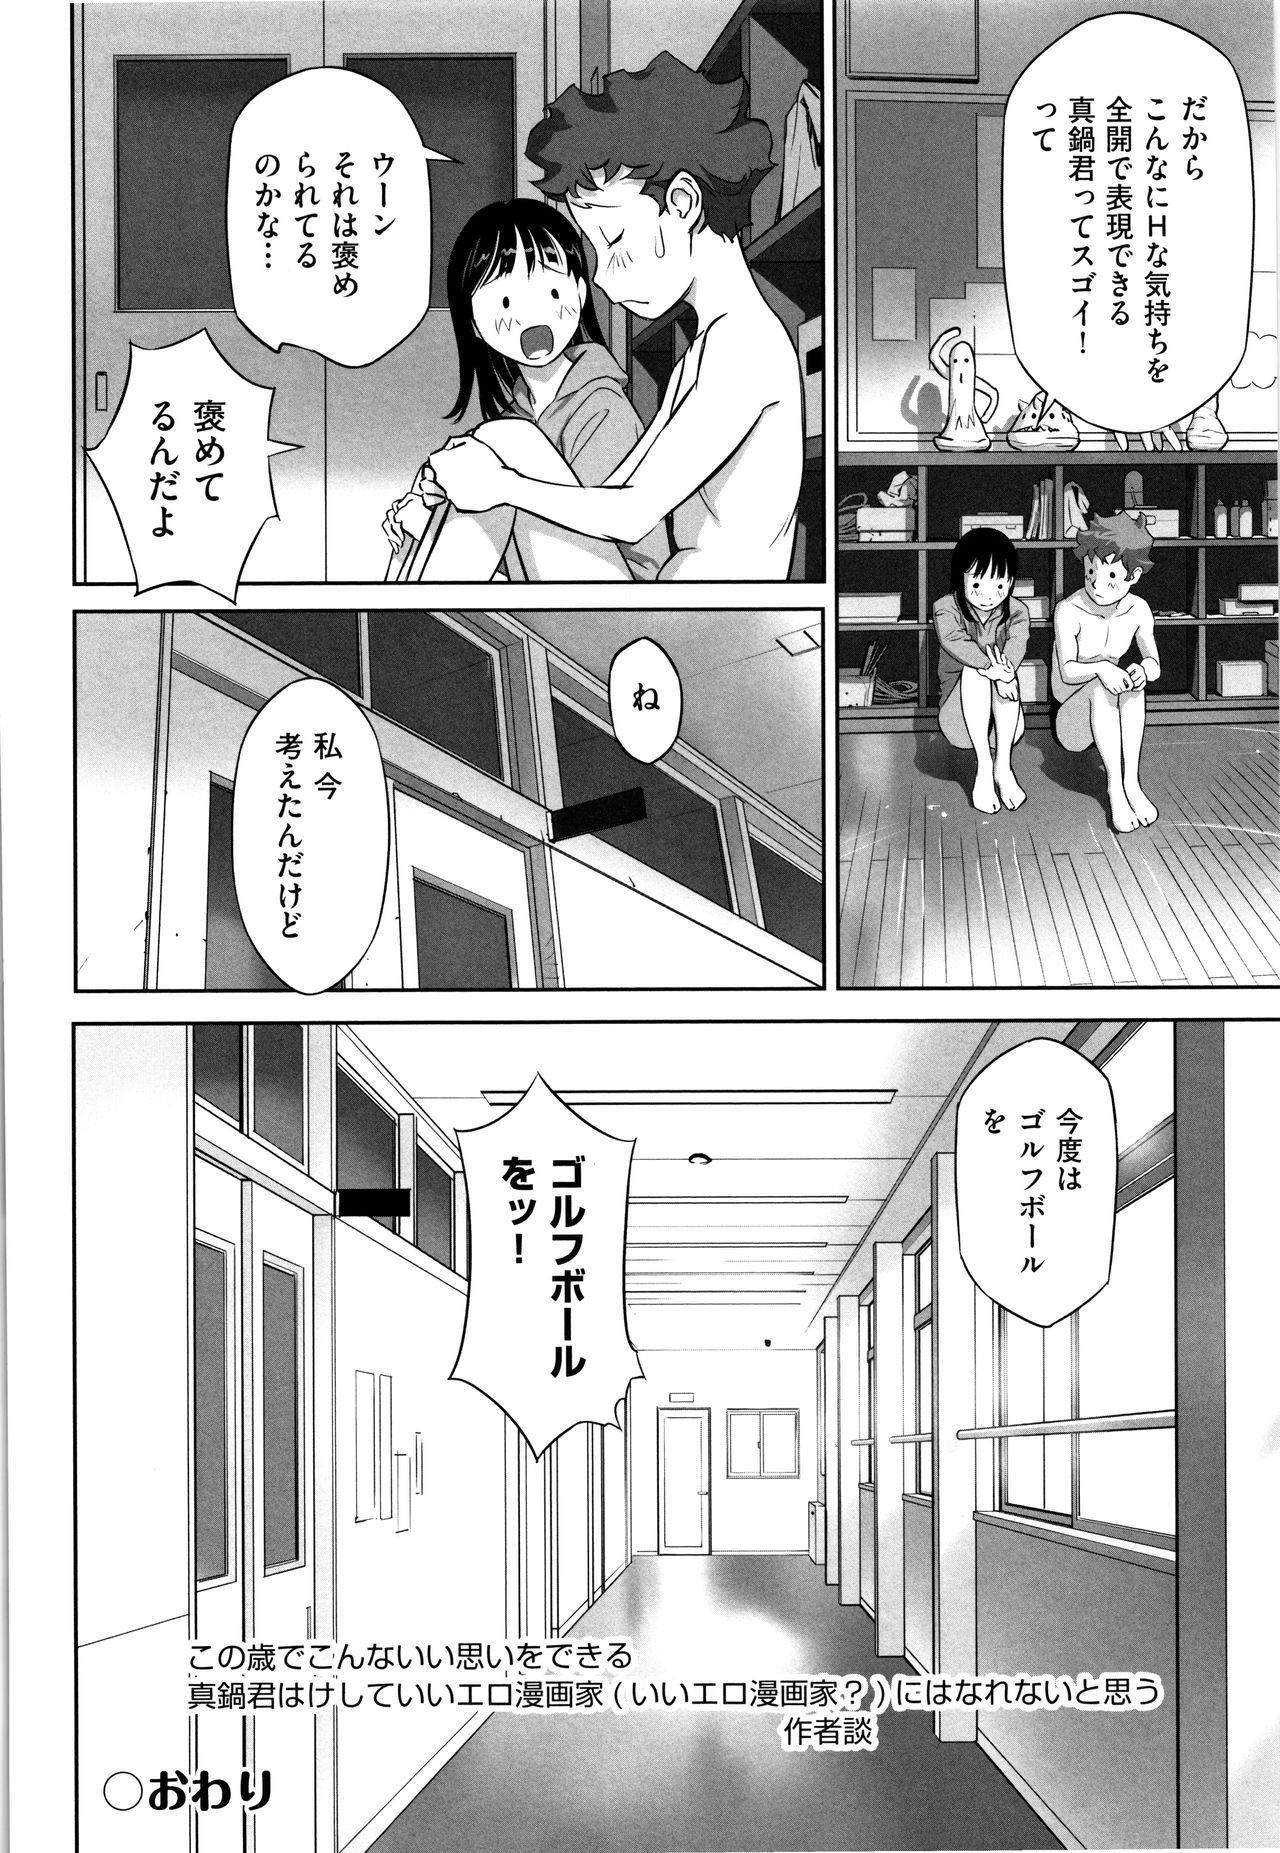 Shoujo Kumikyoku 7 62